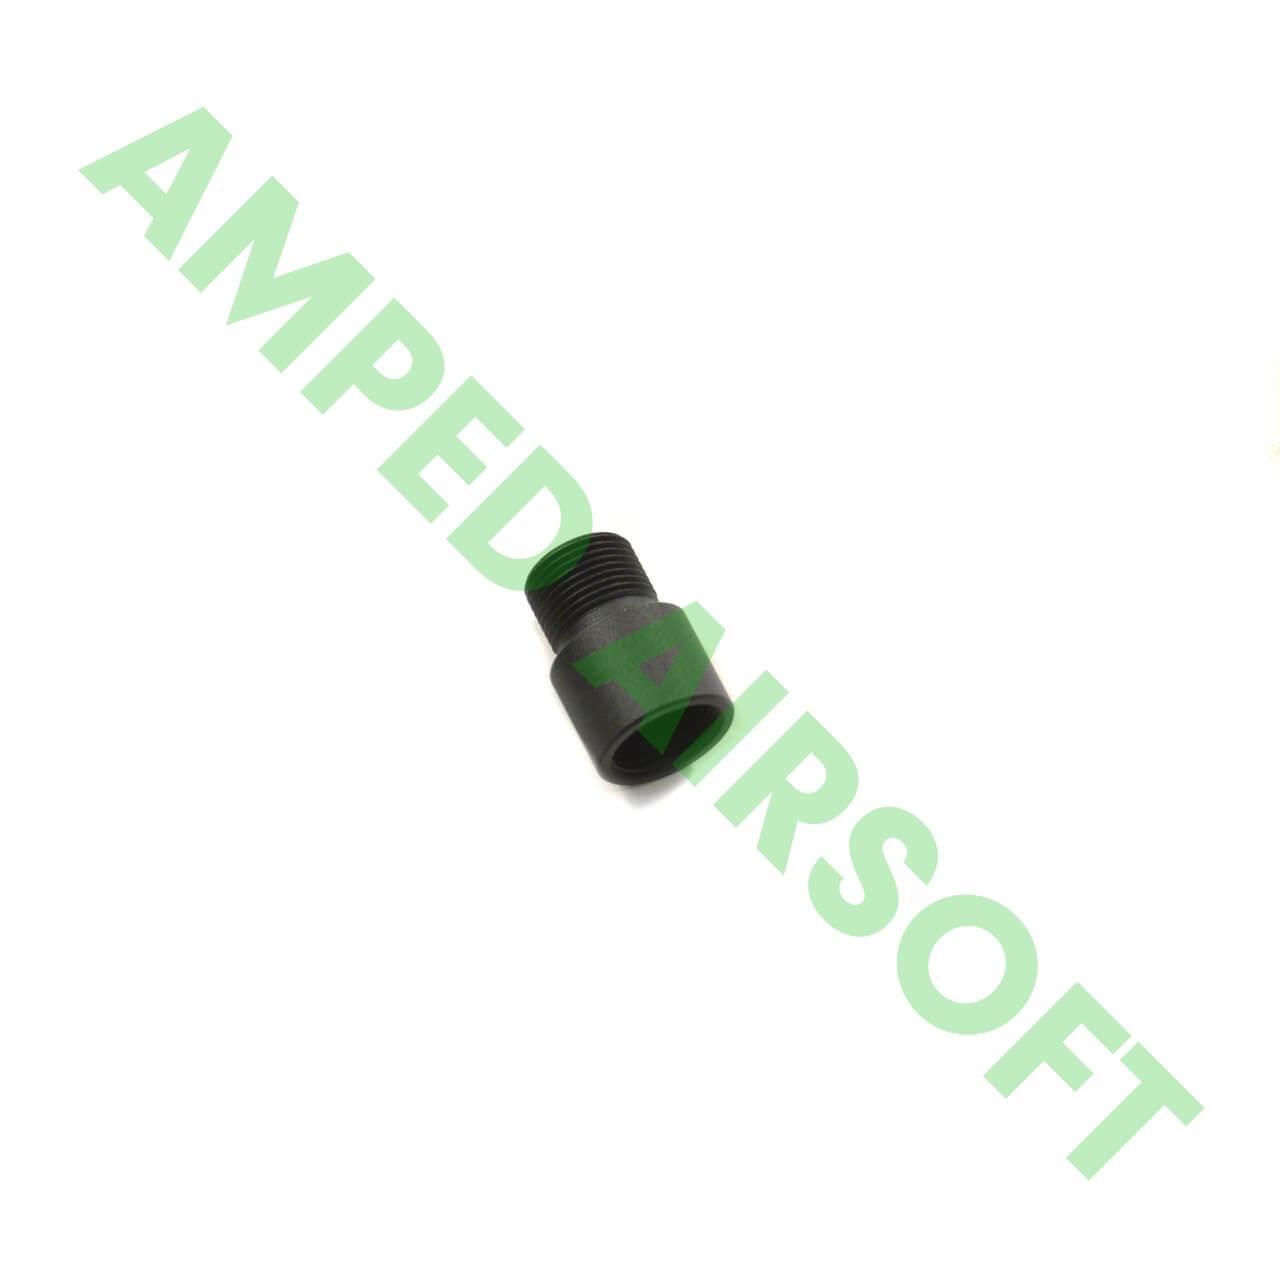 G&P - Barrel Thread Adapter (CW to CCW)